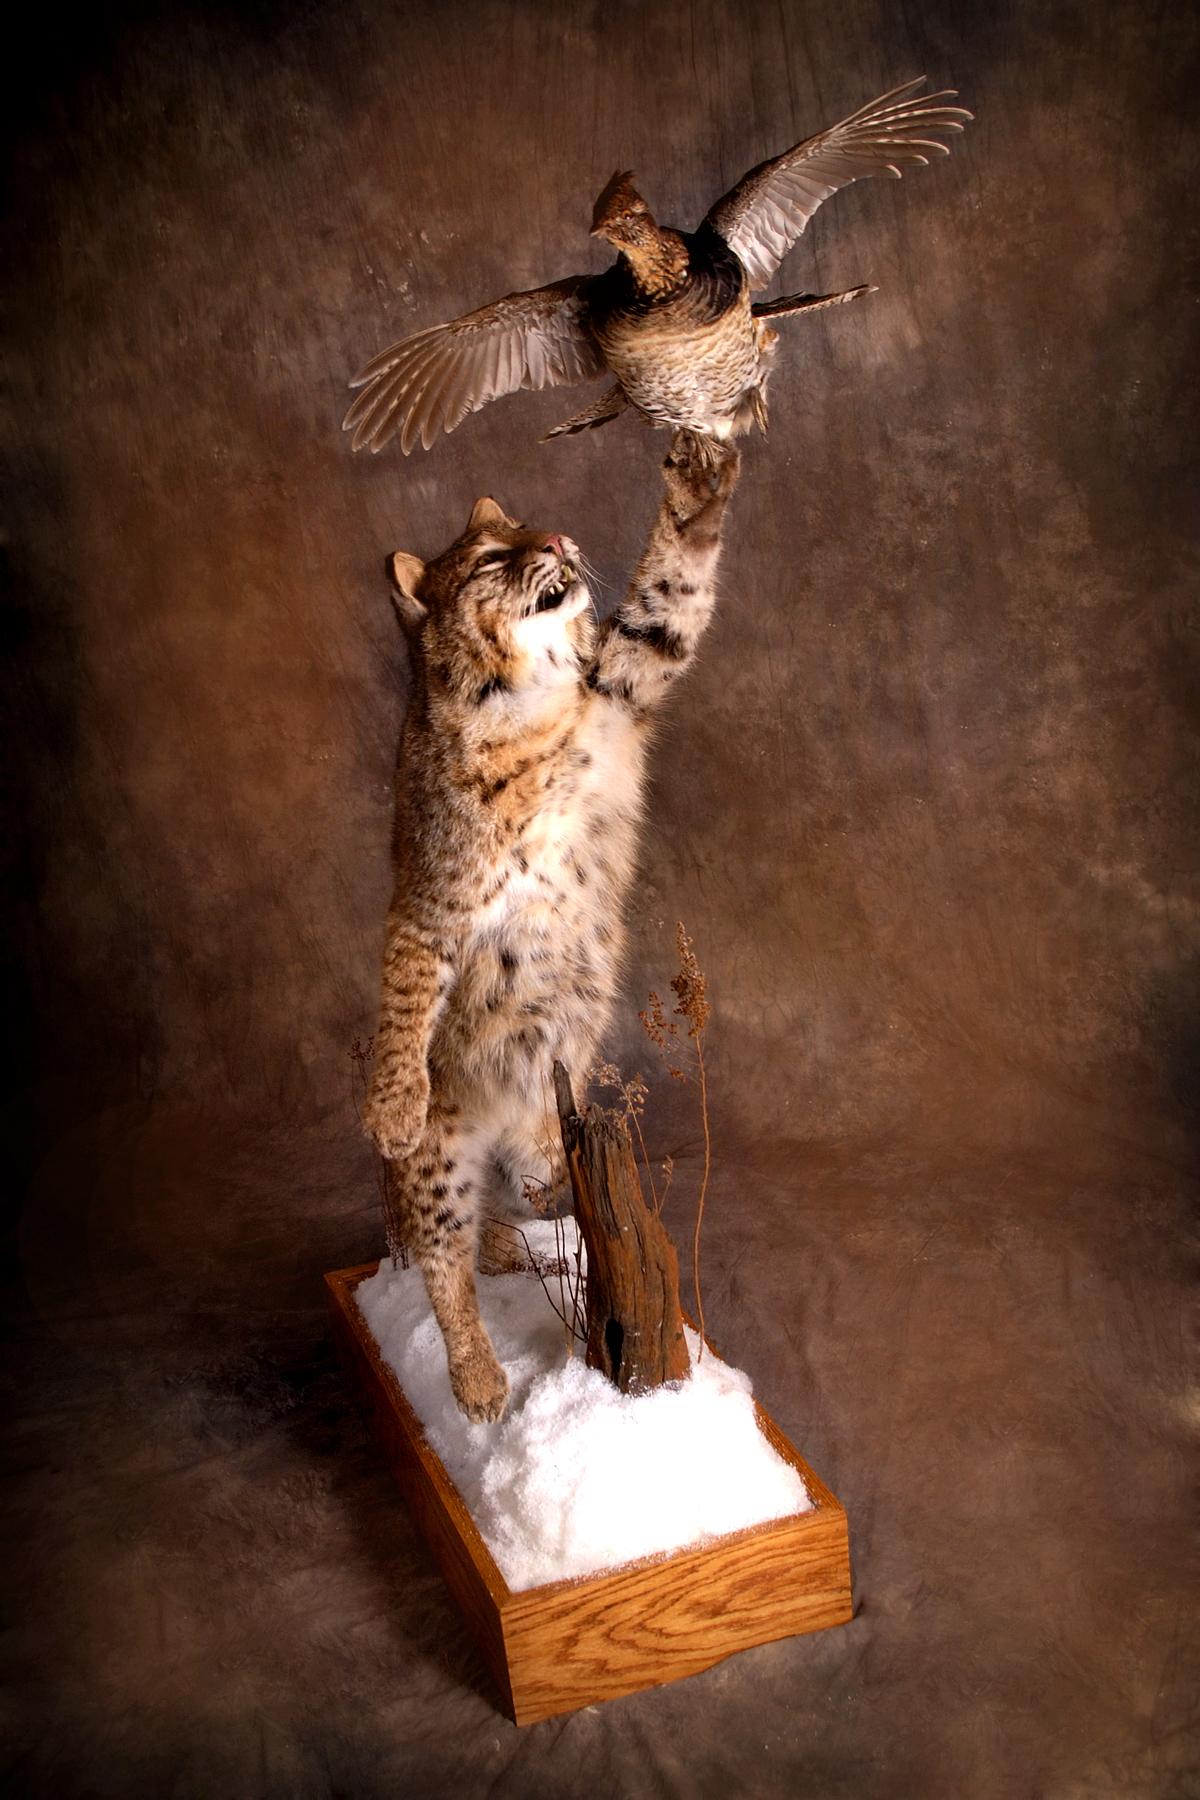 26 Bobcat | Grouse